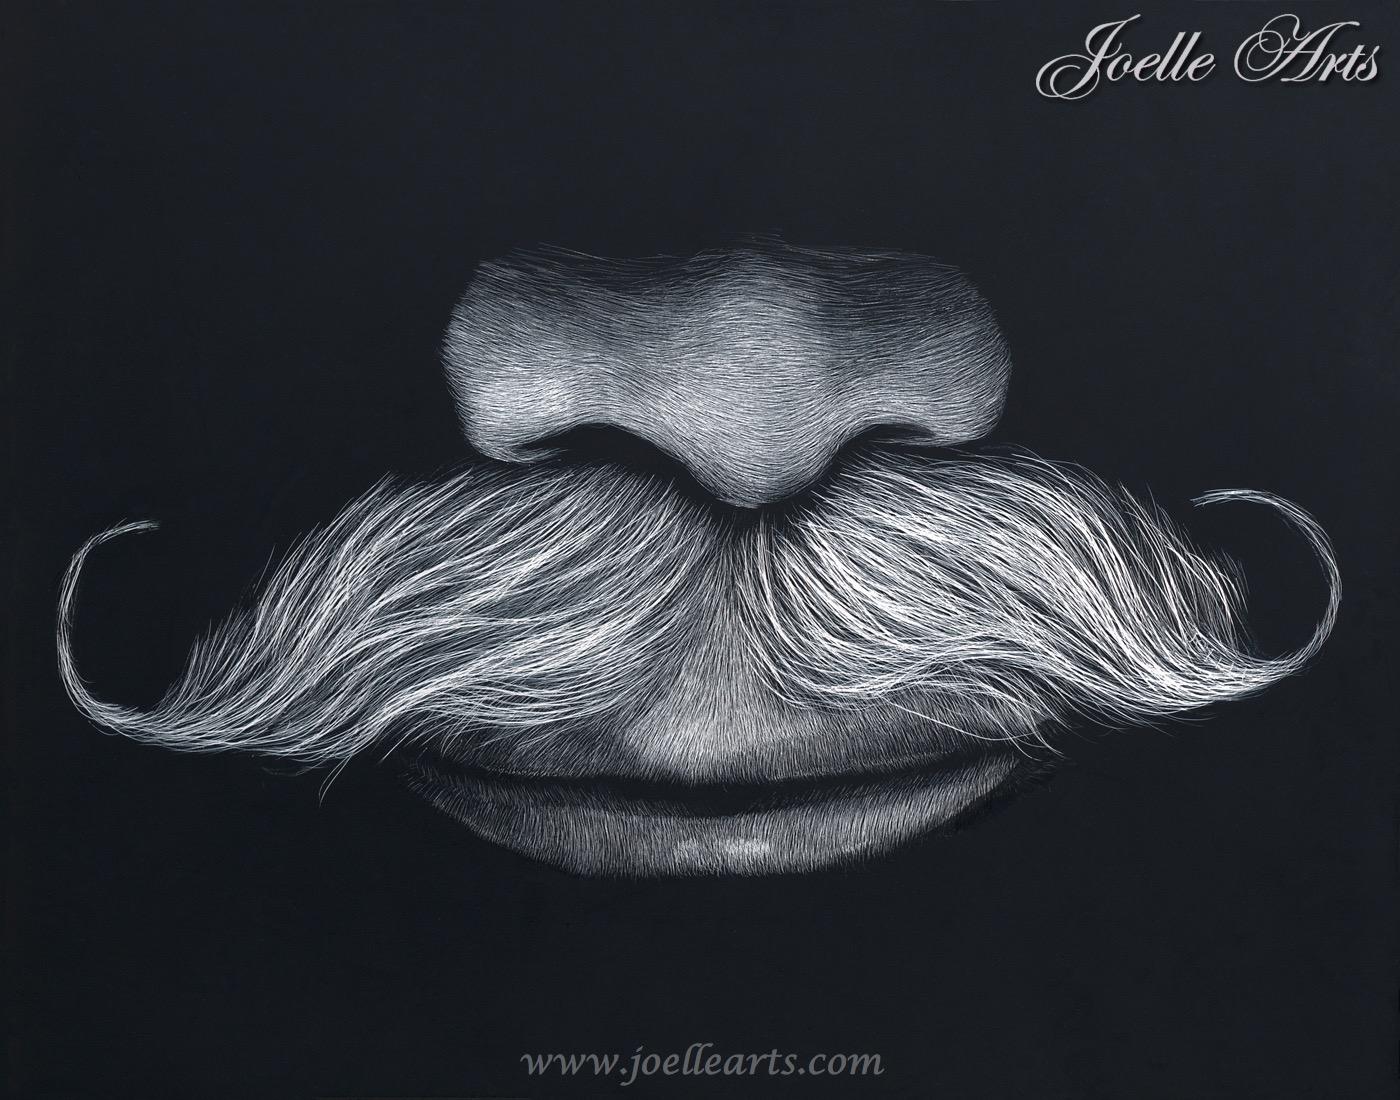 """Doug's Stache'"" The Mustache"